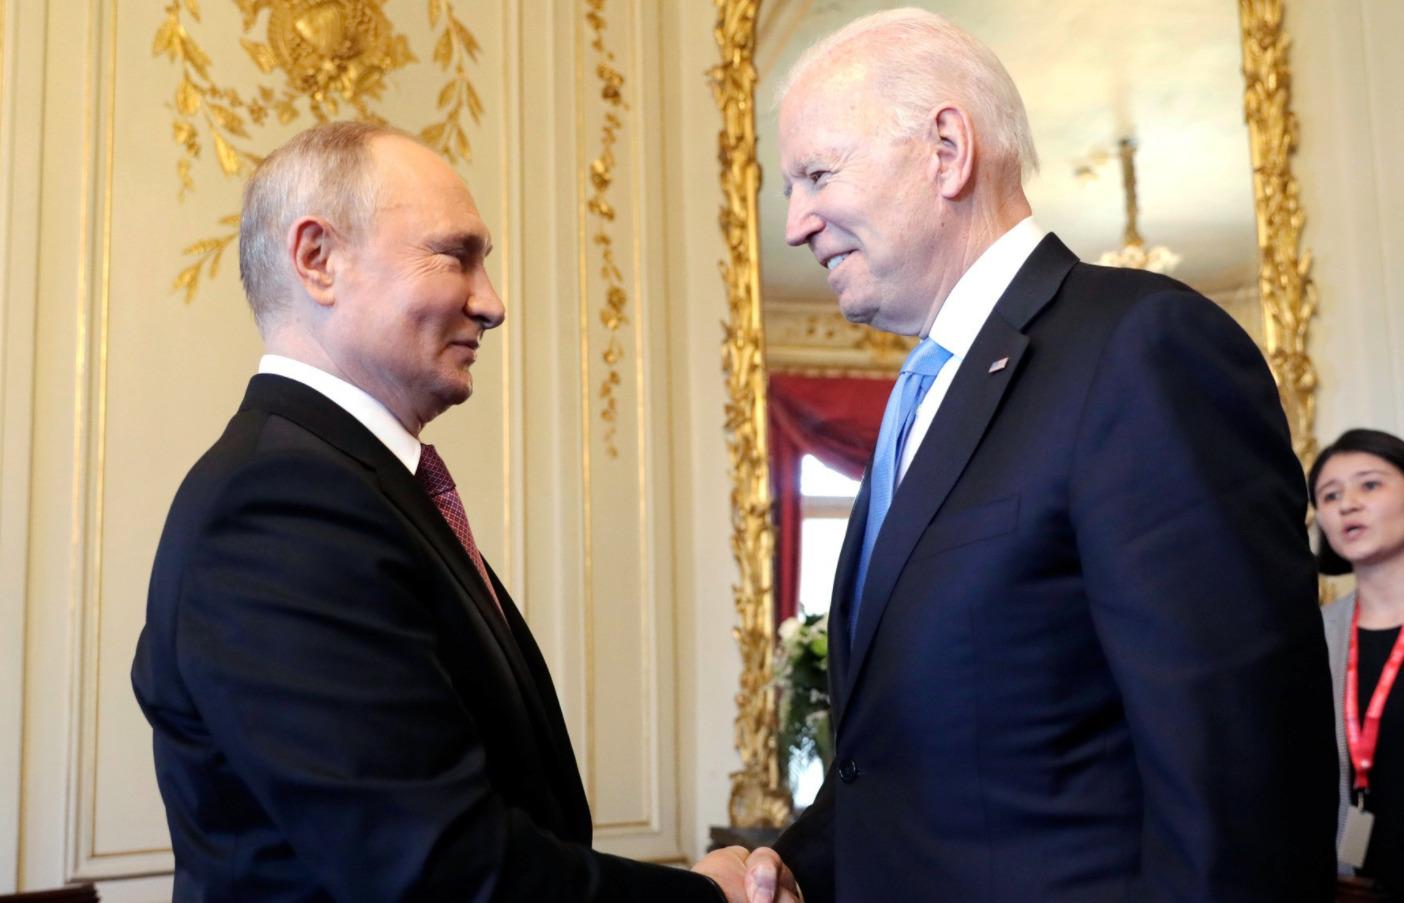 Владимир Путин с президентом США Джозефом Байденом (справа)